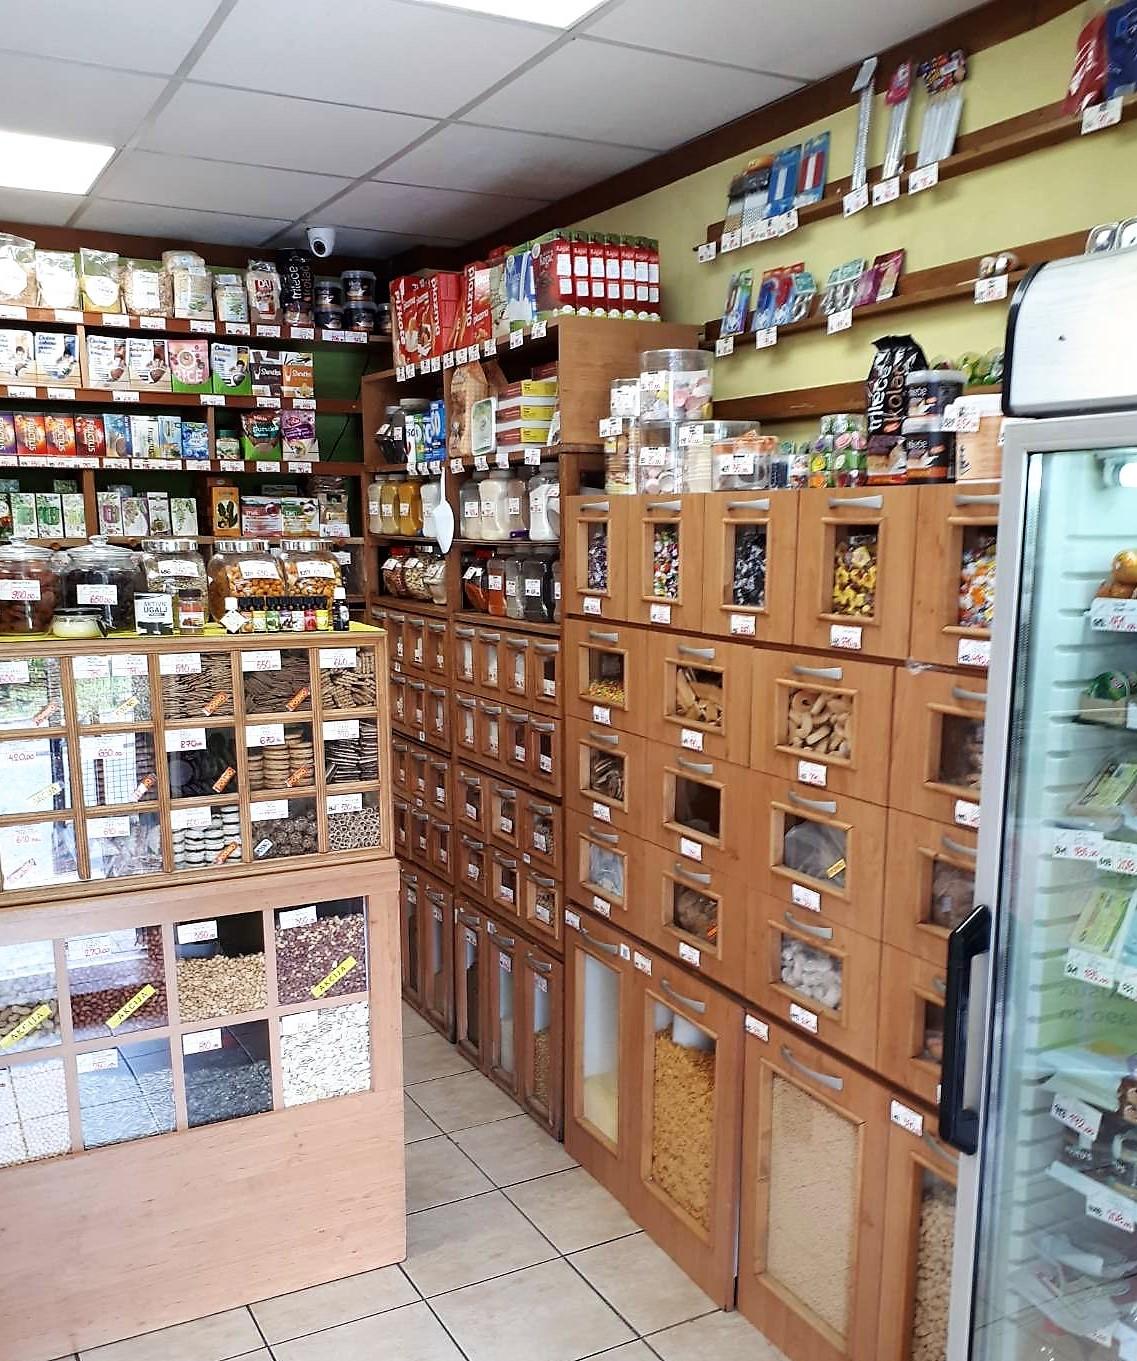 prodavnica_zdrave_hrane_libra_vozdovac_kumodraska_unutra